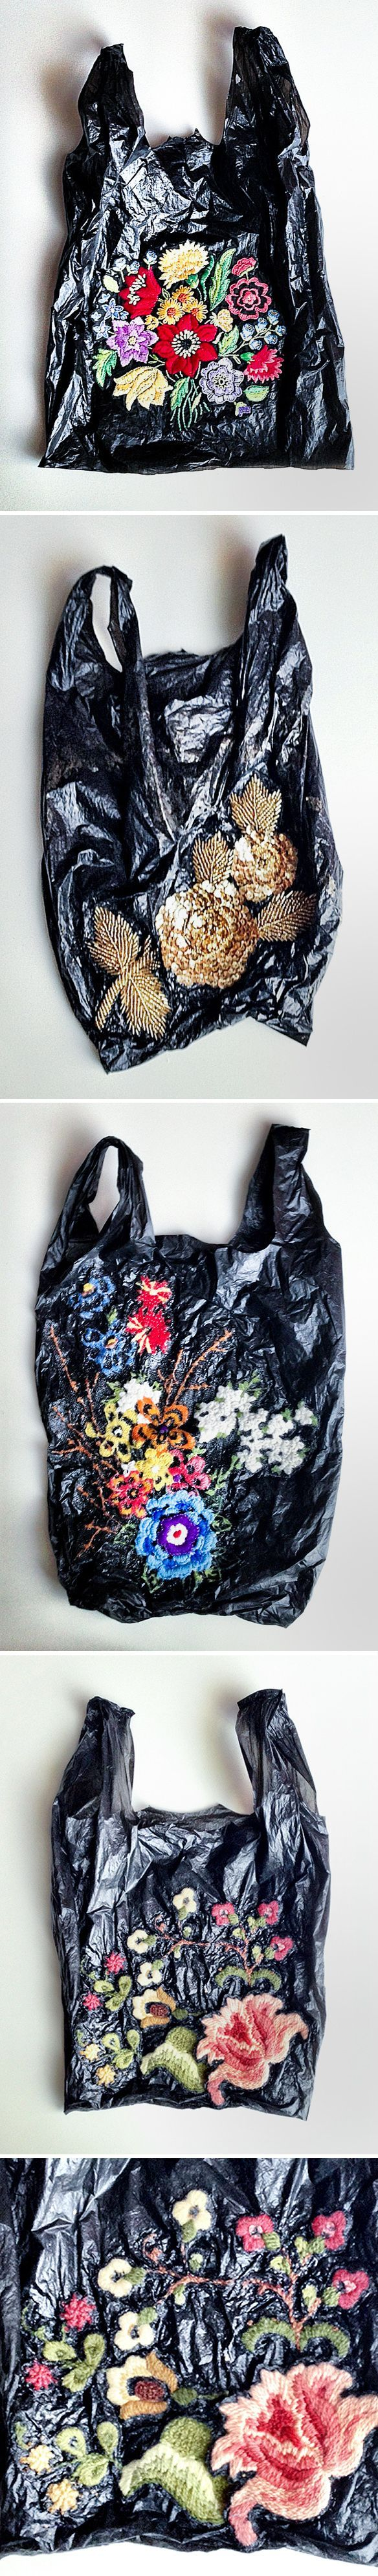 Embroidery on Old Plastic Shopping Bags: nicoletta daríta de la brown: